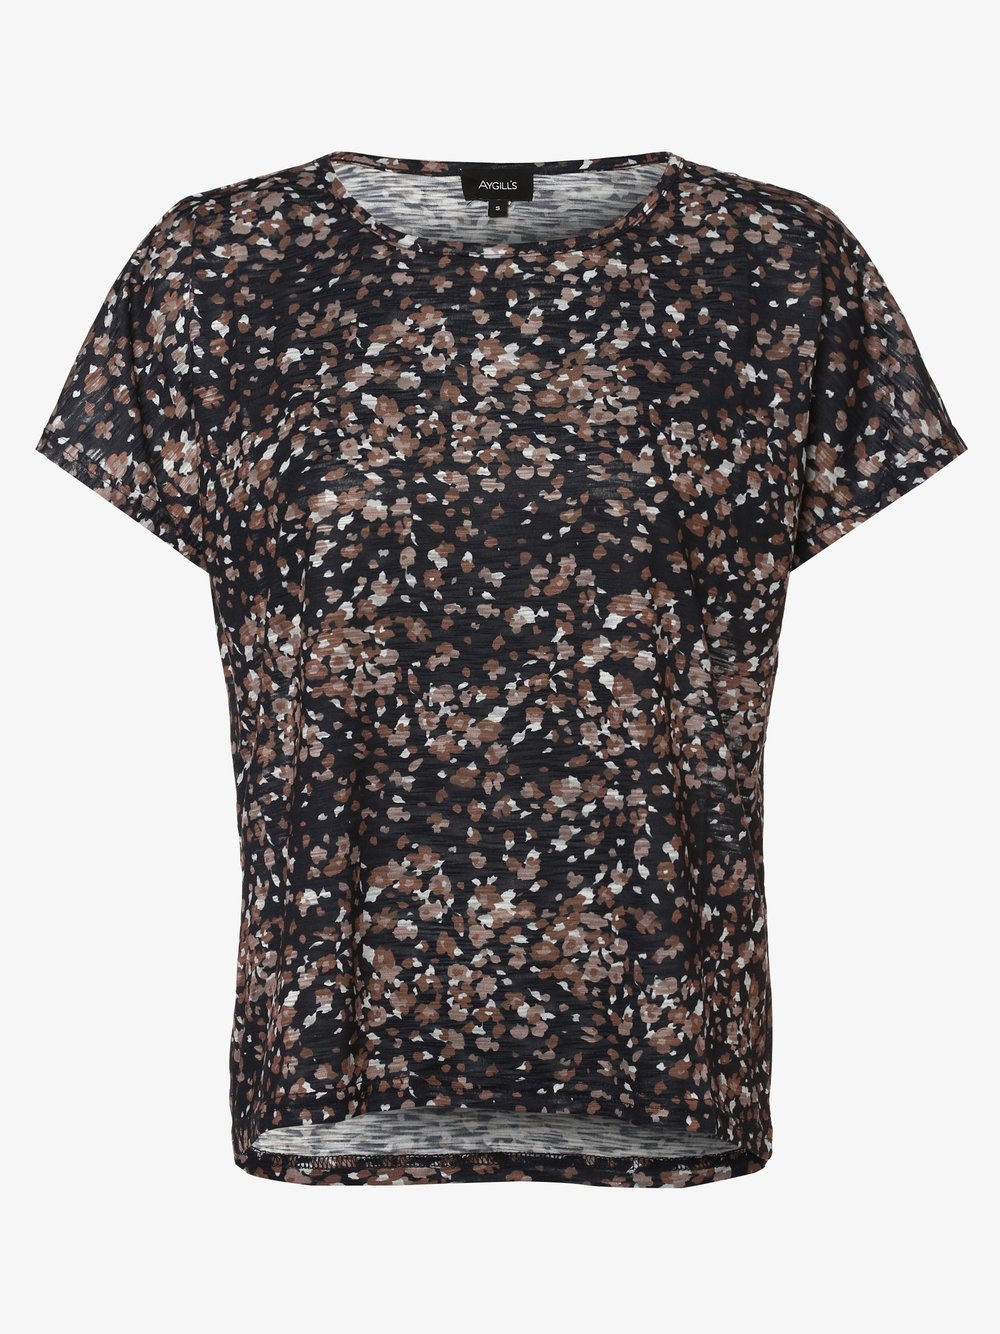 Aygill's - T-shirt damski, beżowy